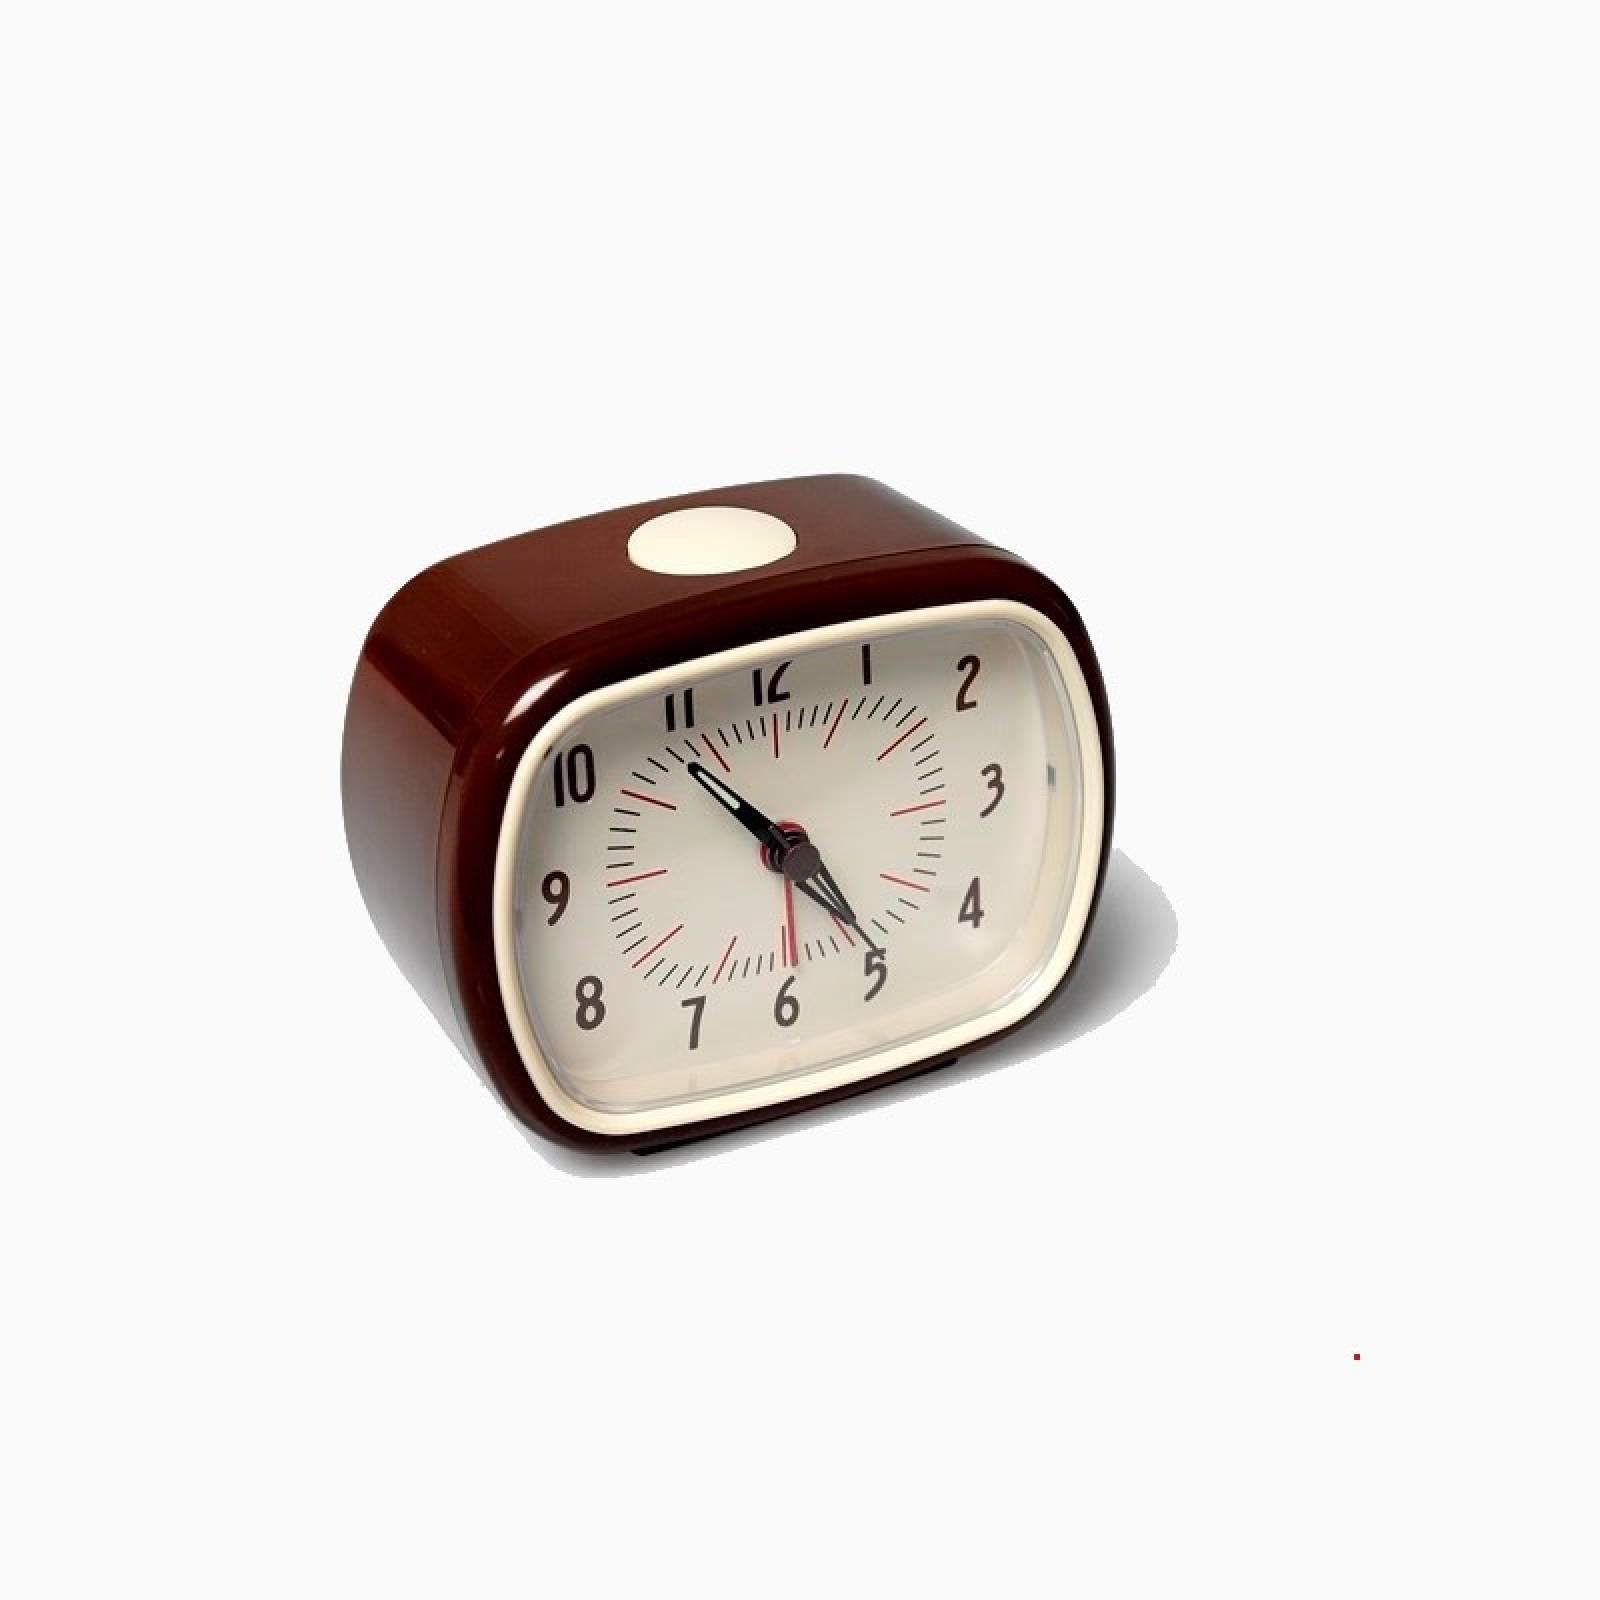 Retro Alarm Clock - Brown